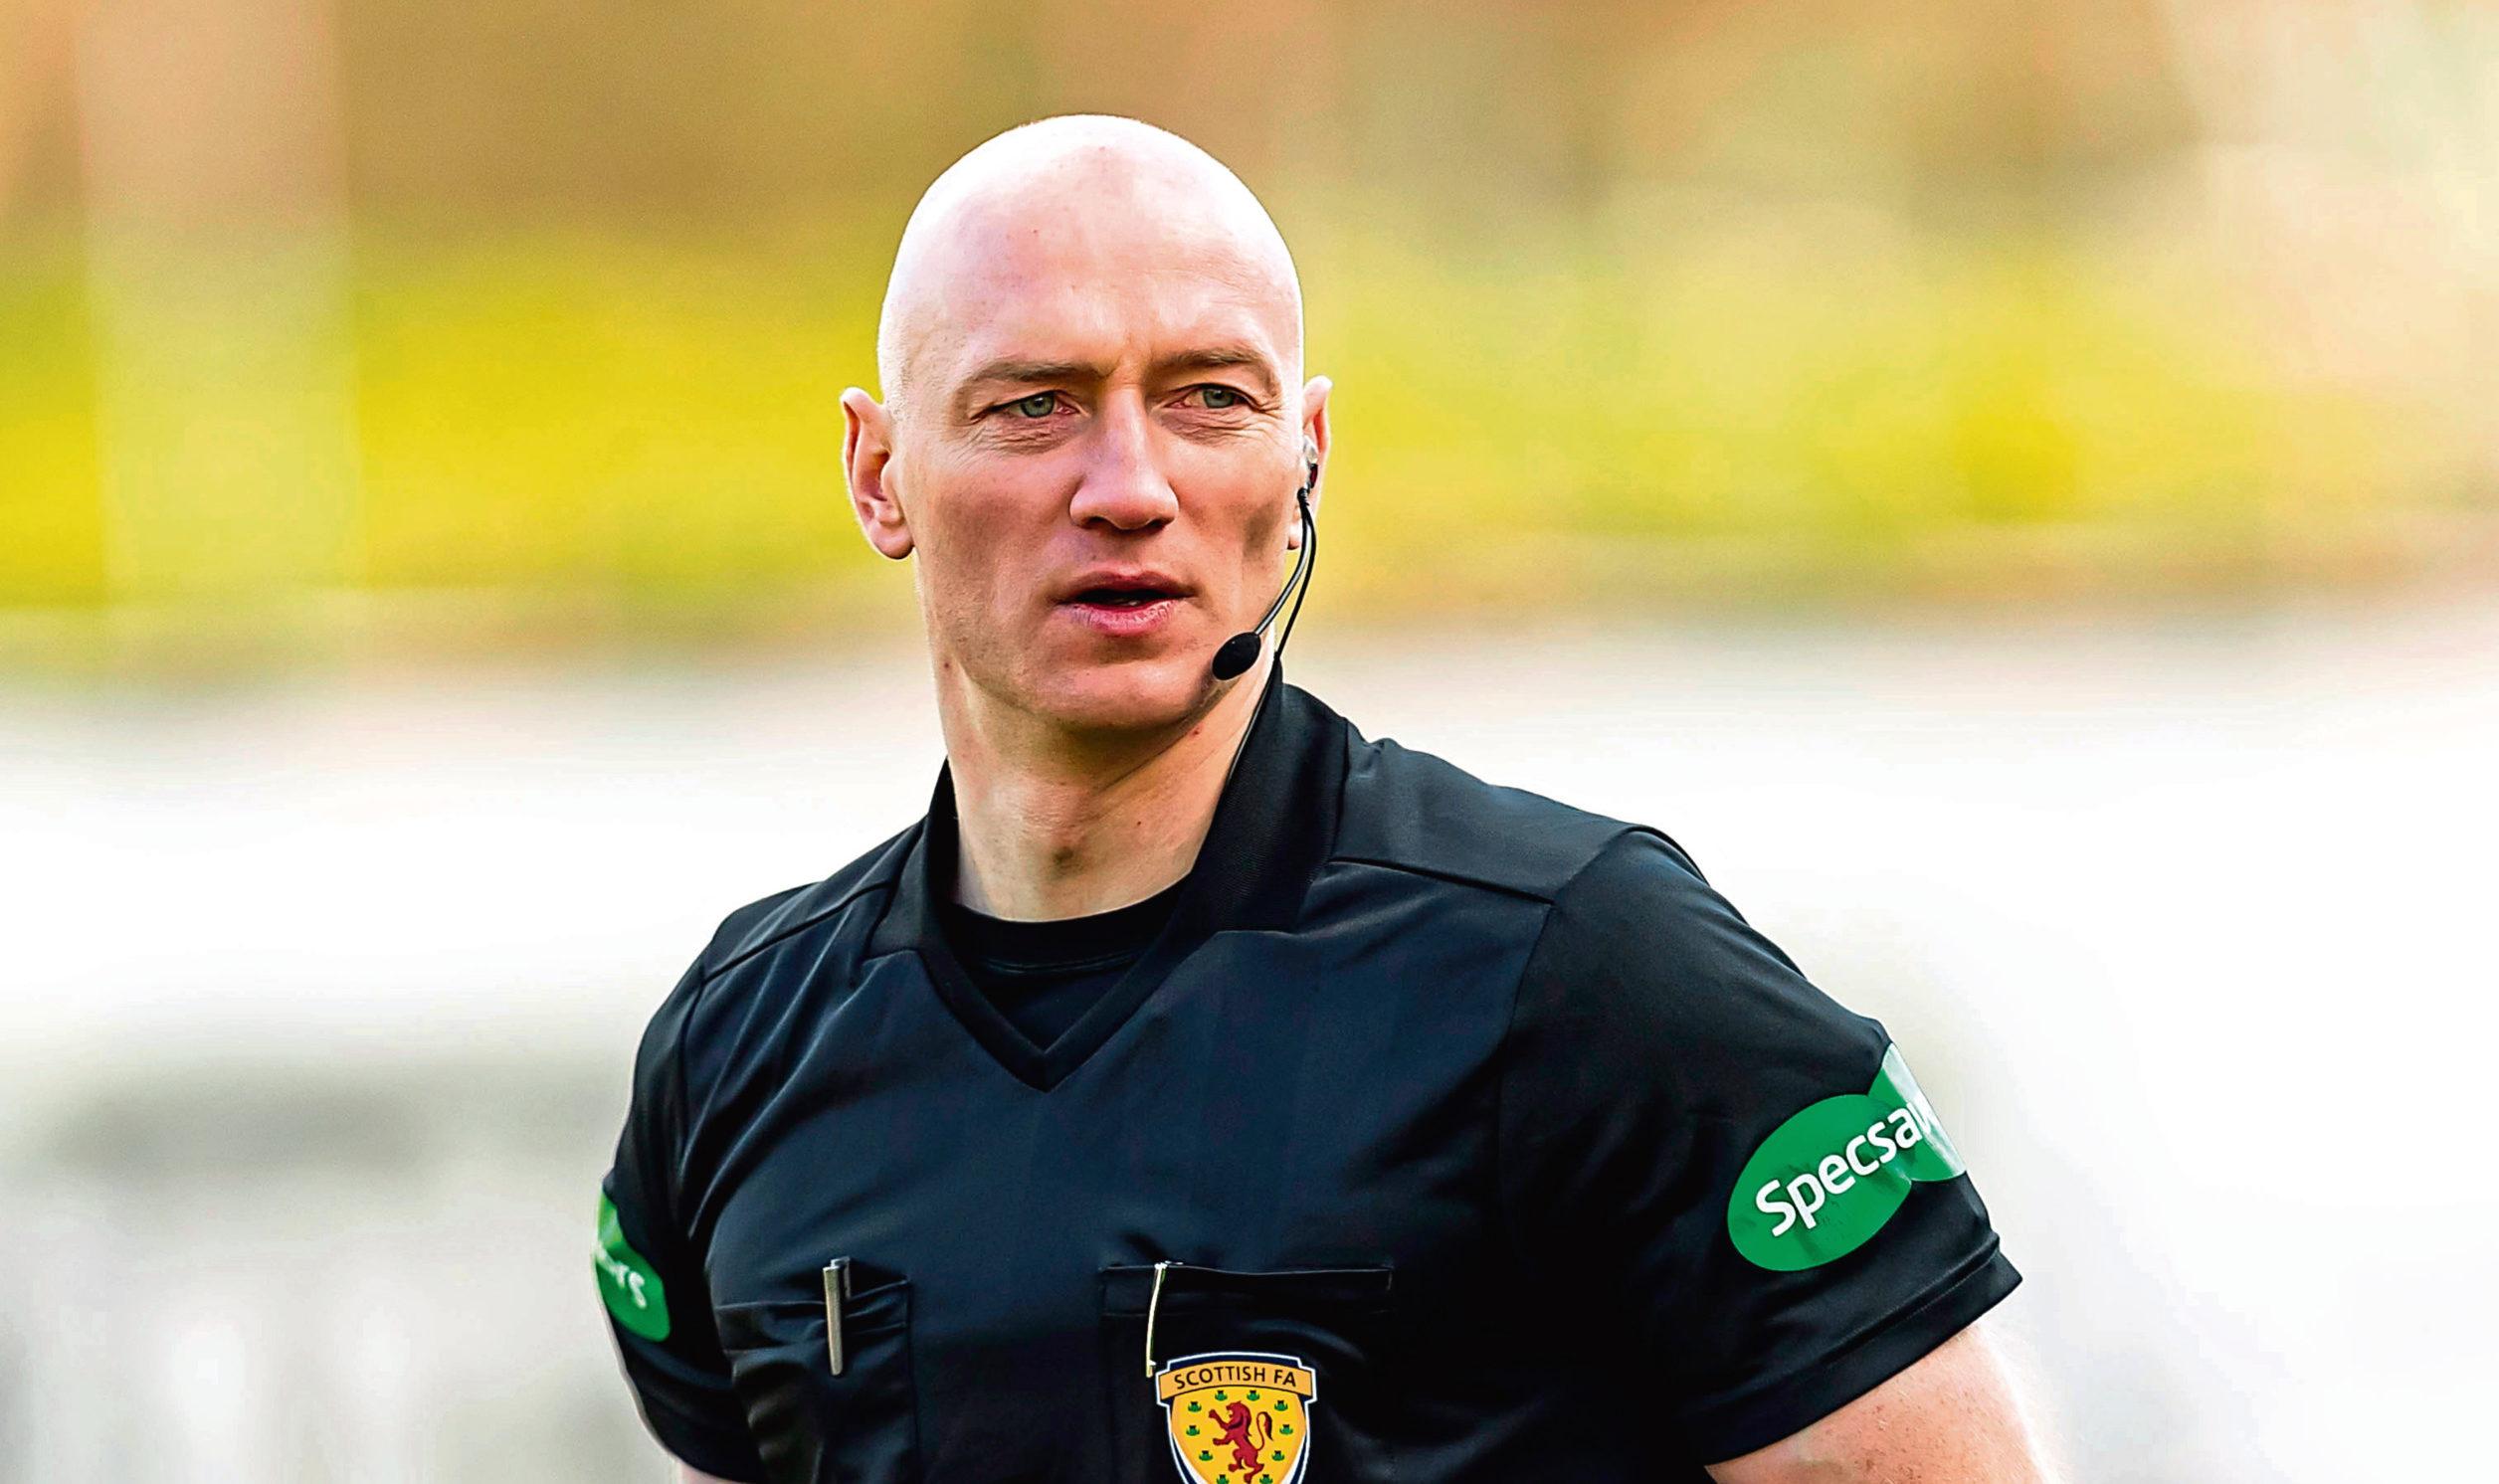 Referee Alan Newlands